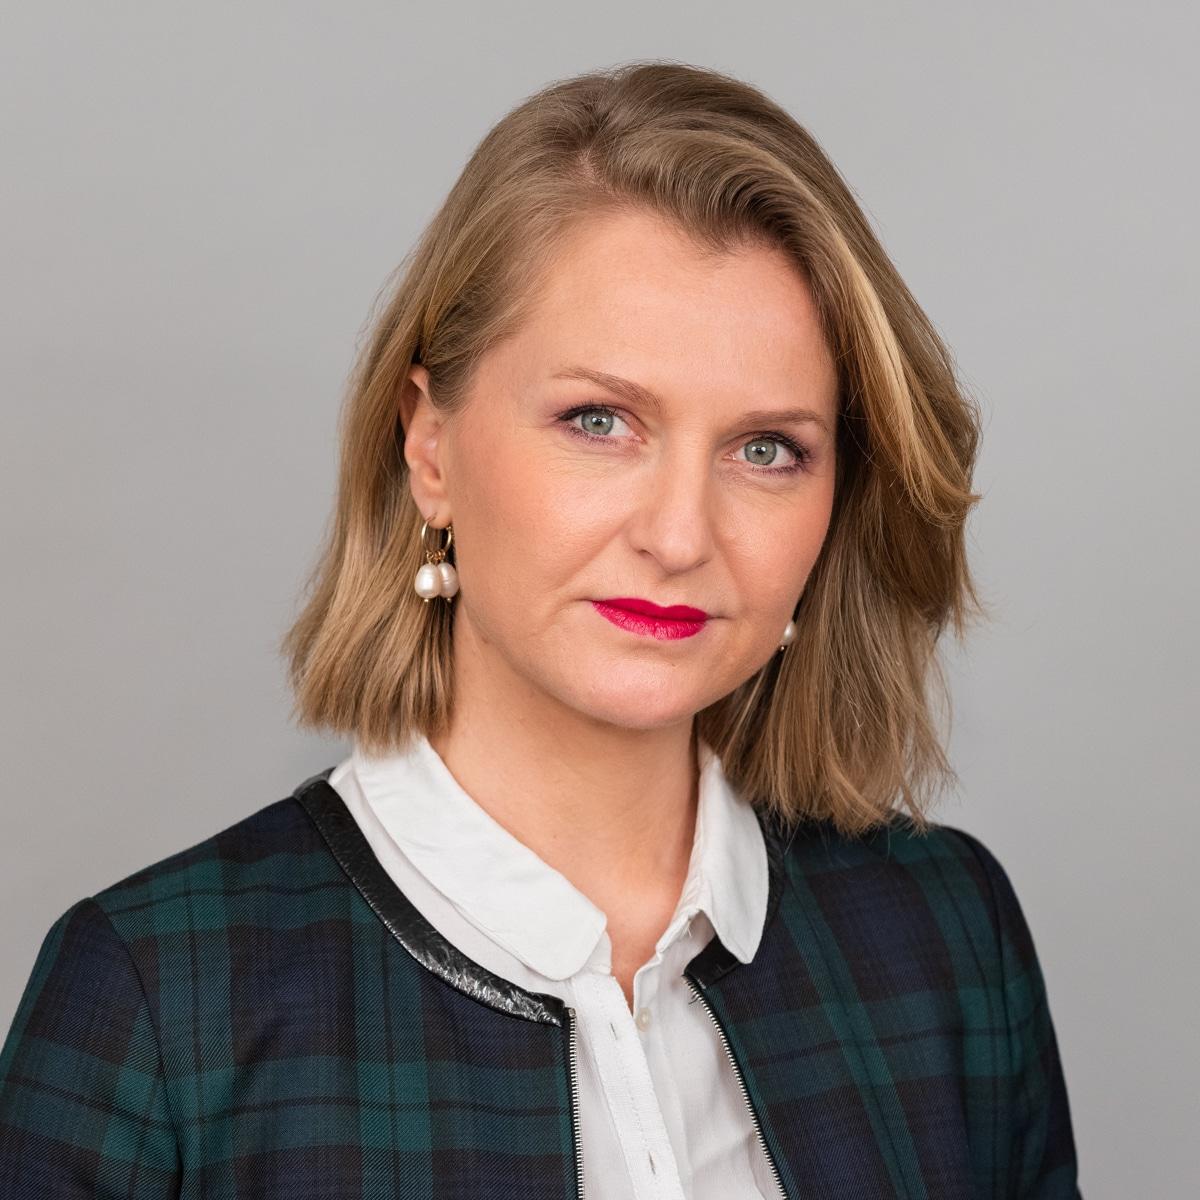 Anne Laure Daniel